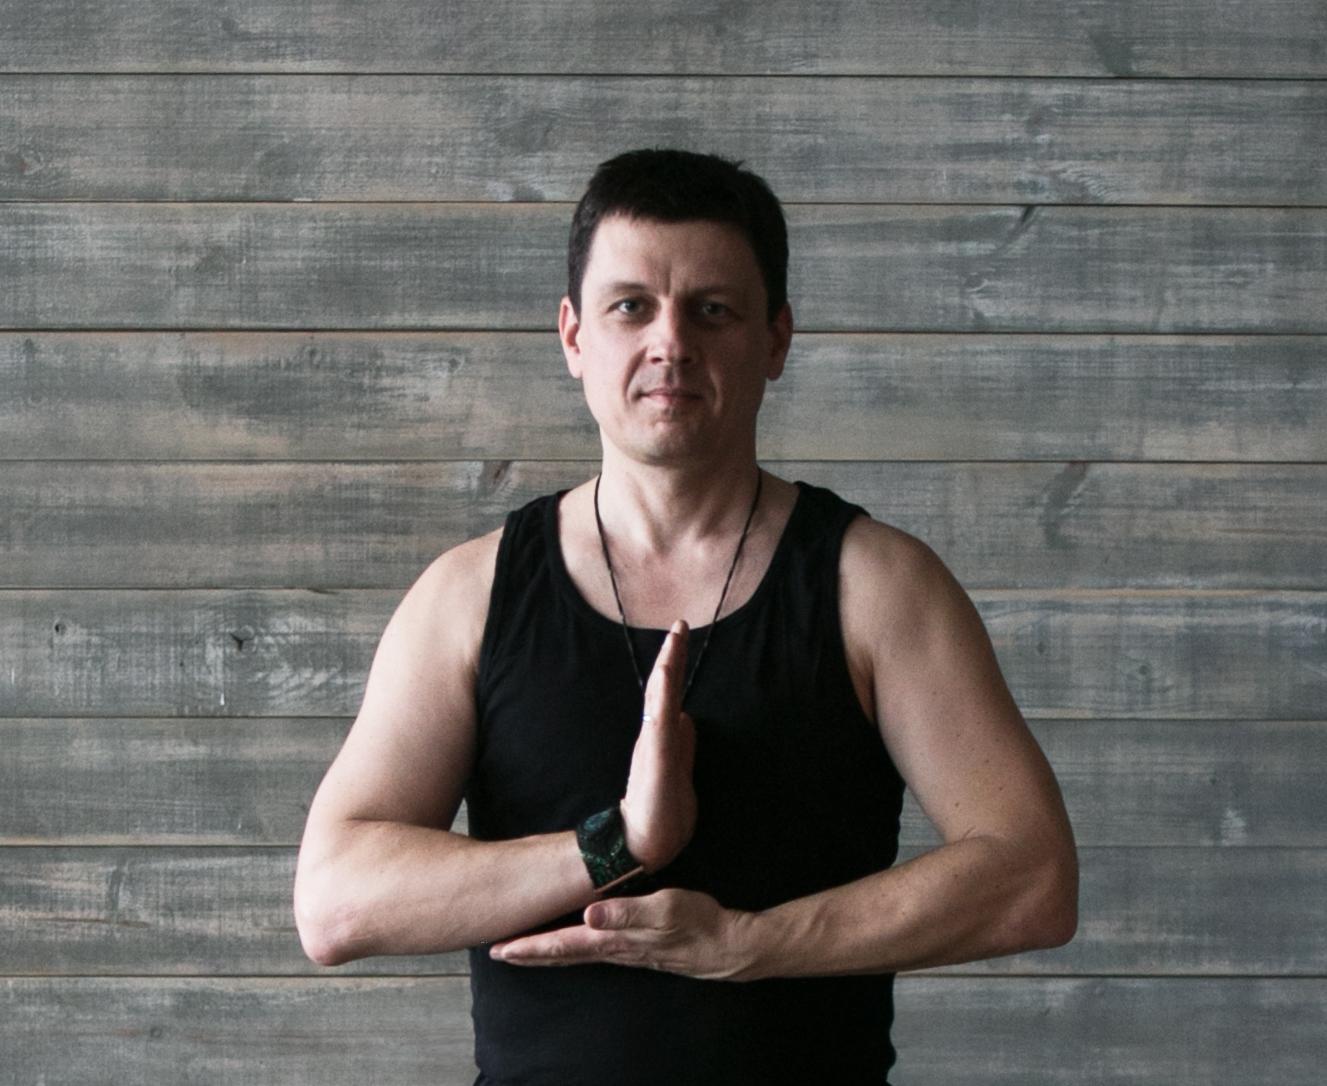 energetichna-sila-grudey-foto-golih-taksi-onlayn